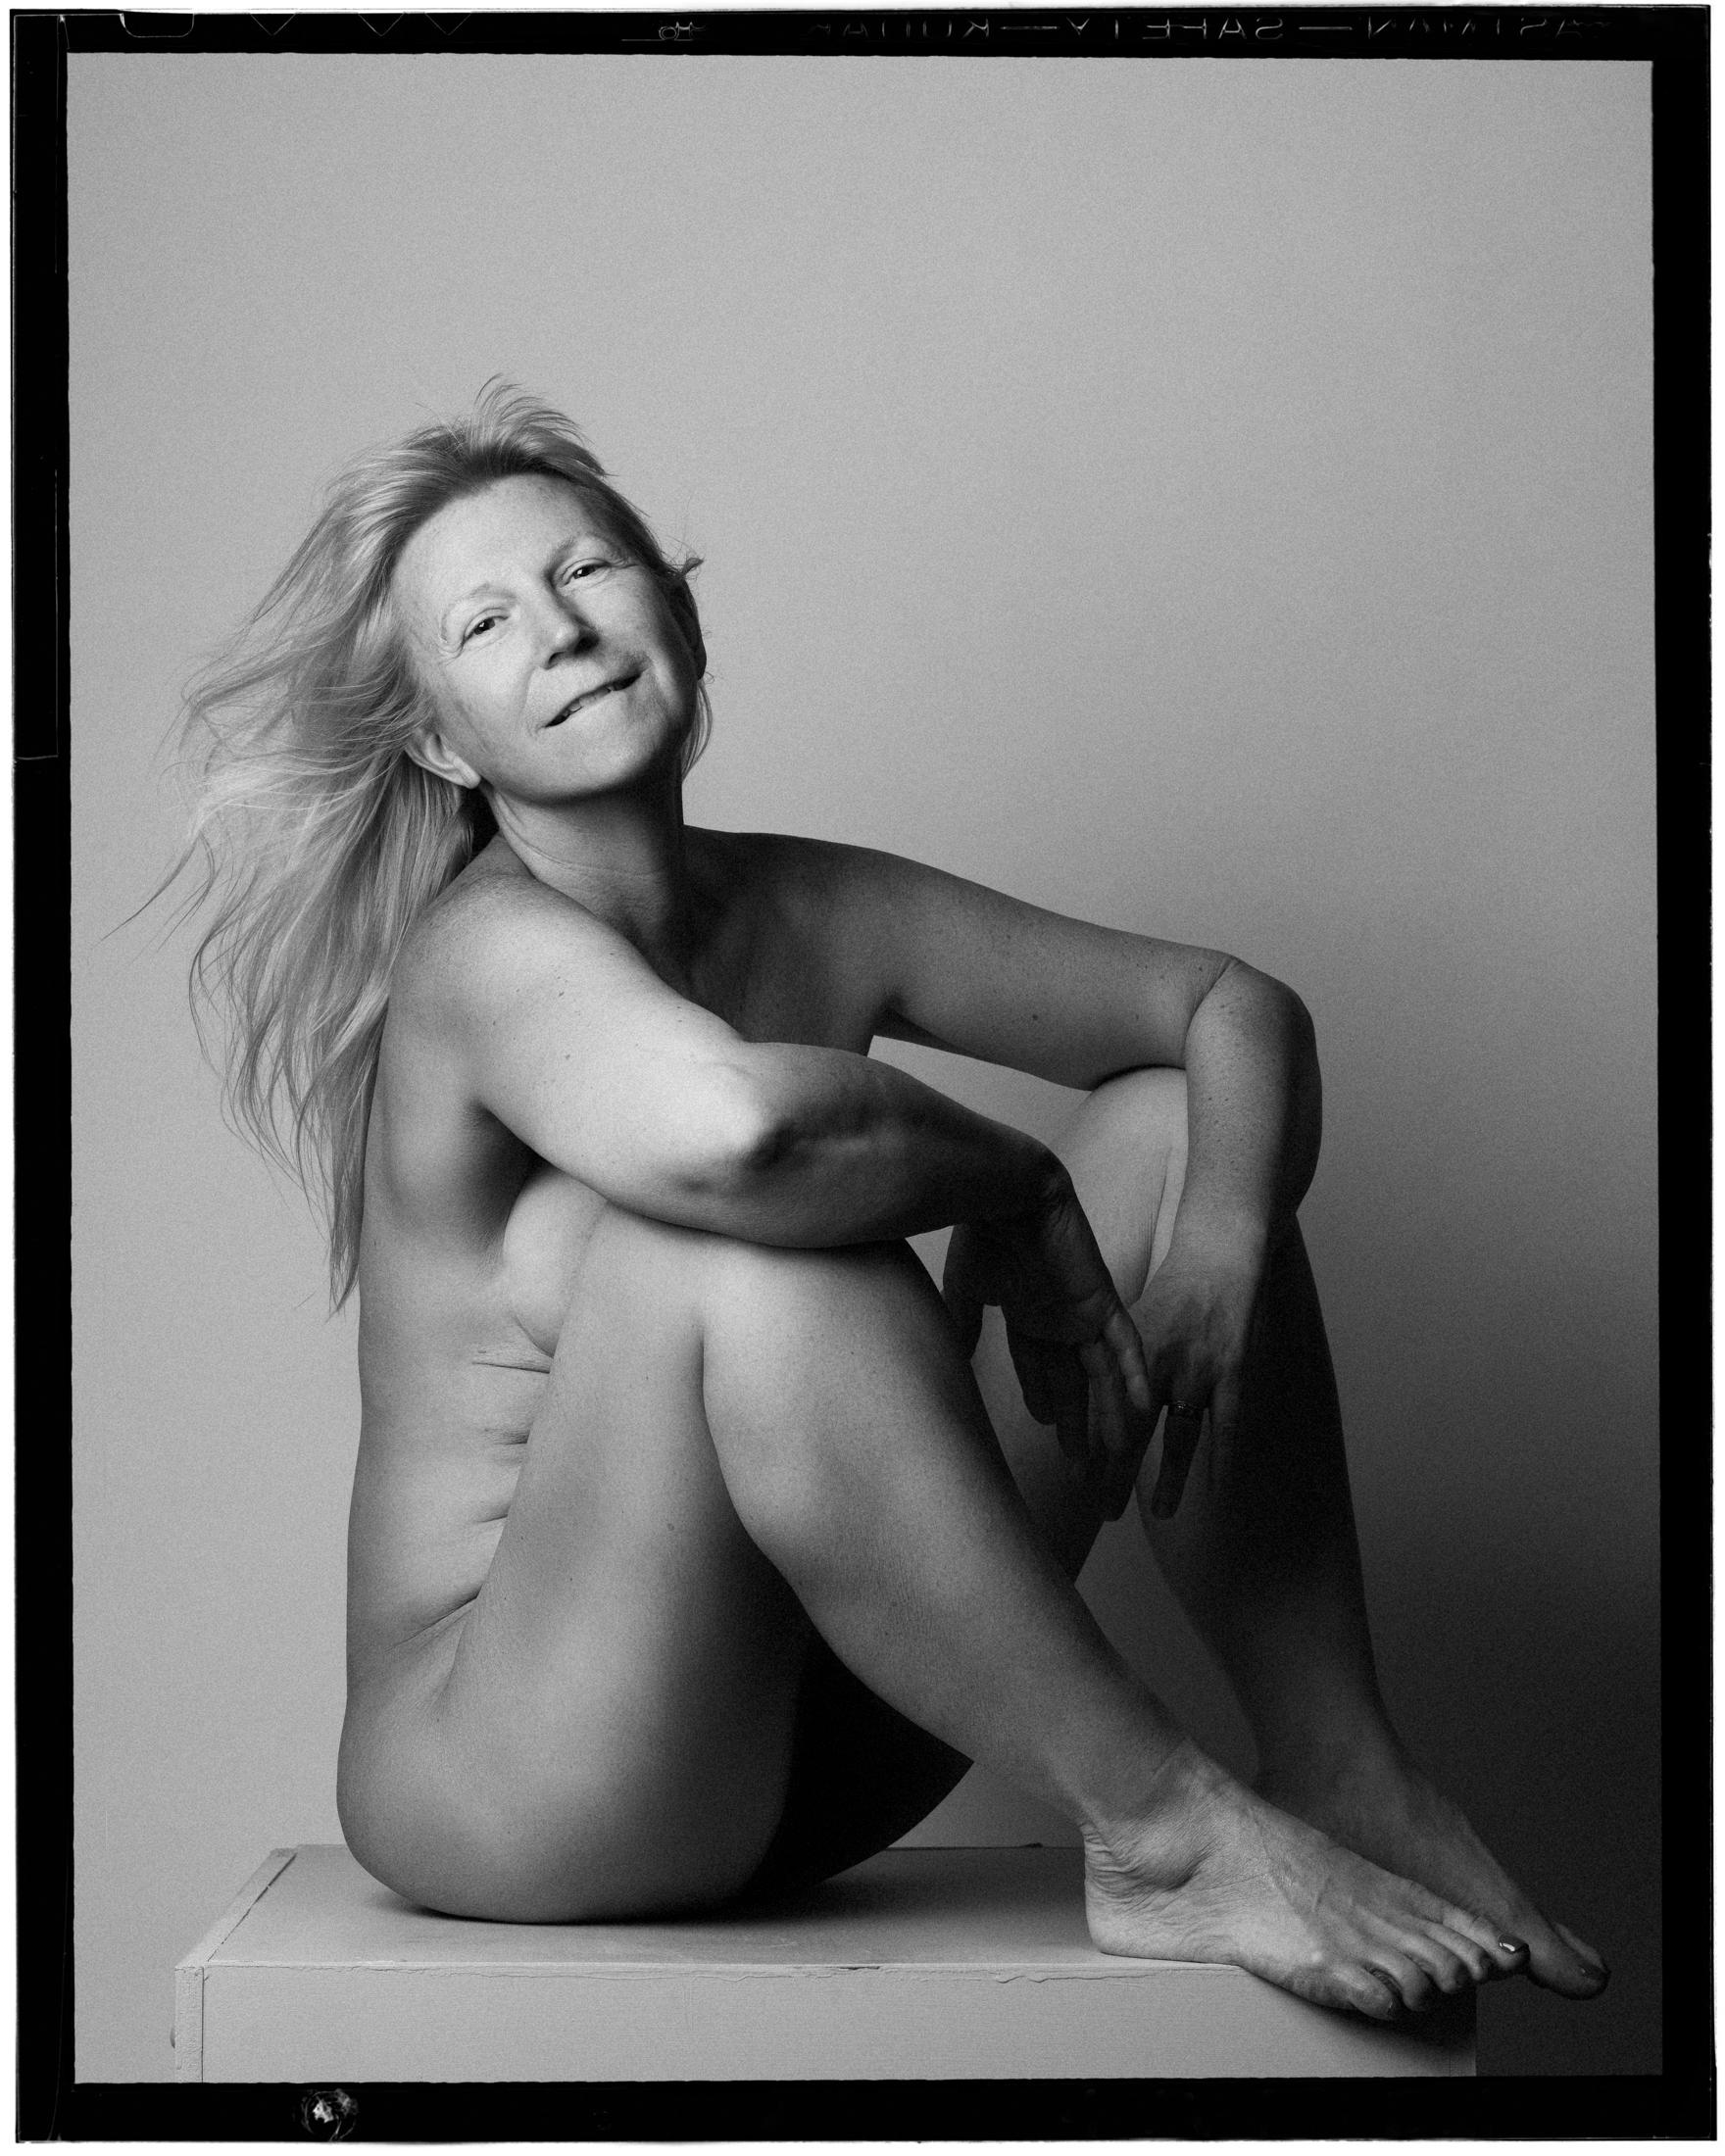 wildwomanproject_karamariestudios5.jpg